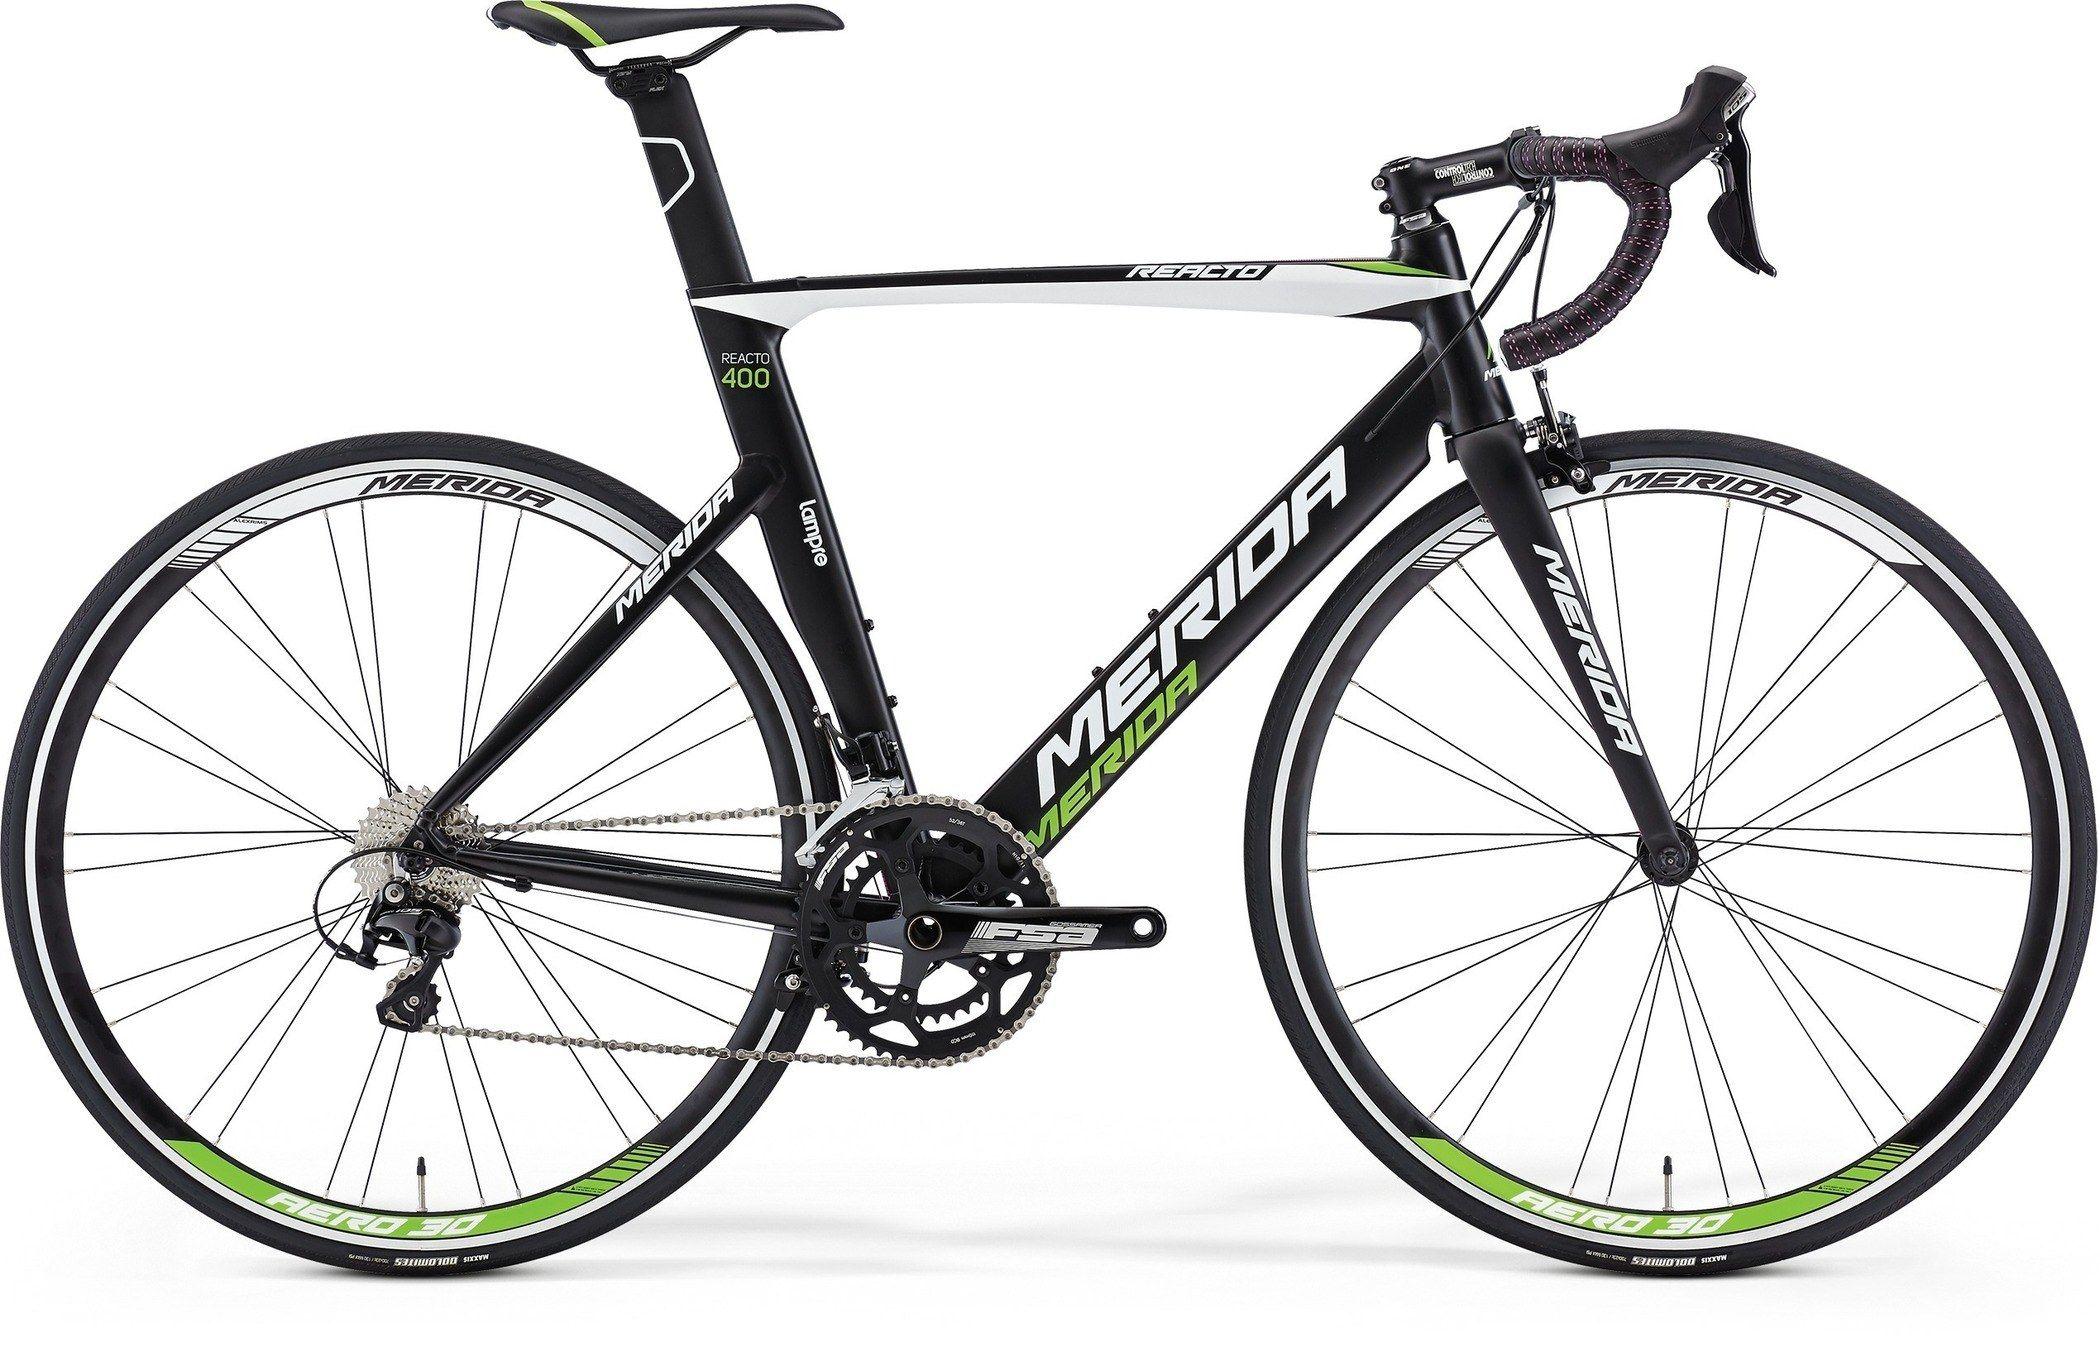 Reacto 400 Merida Bikes International Merida Bikes Road Bike Road Bikes